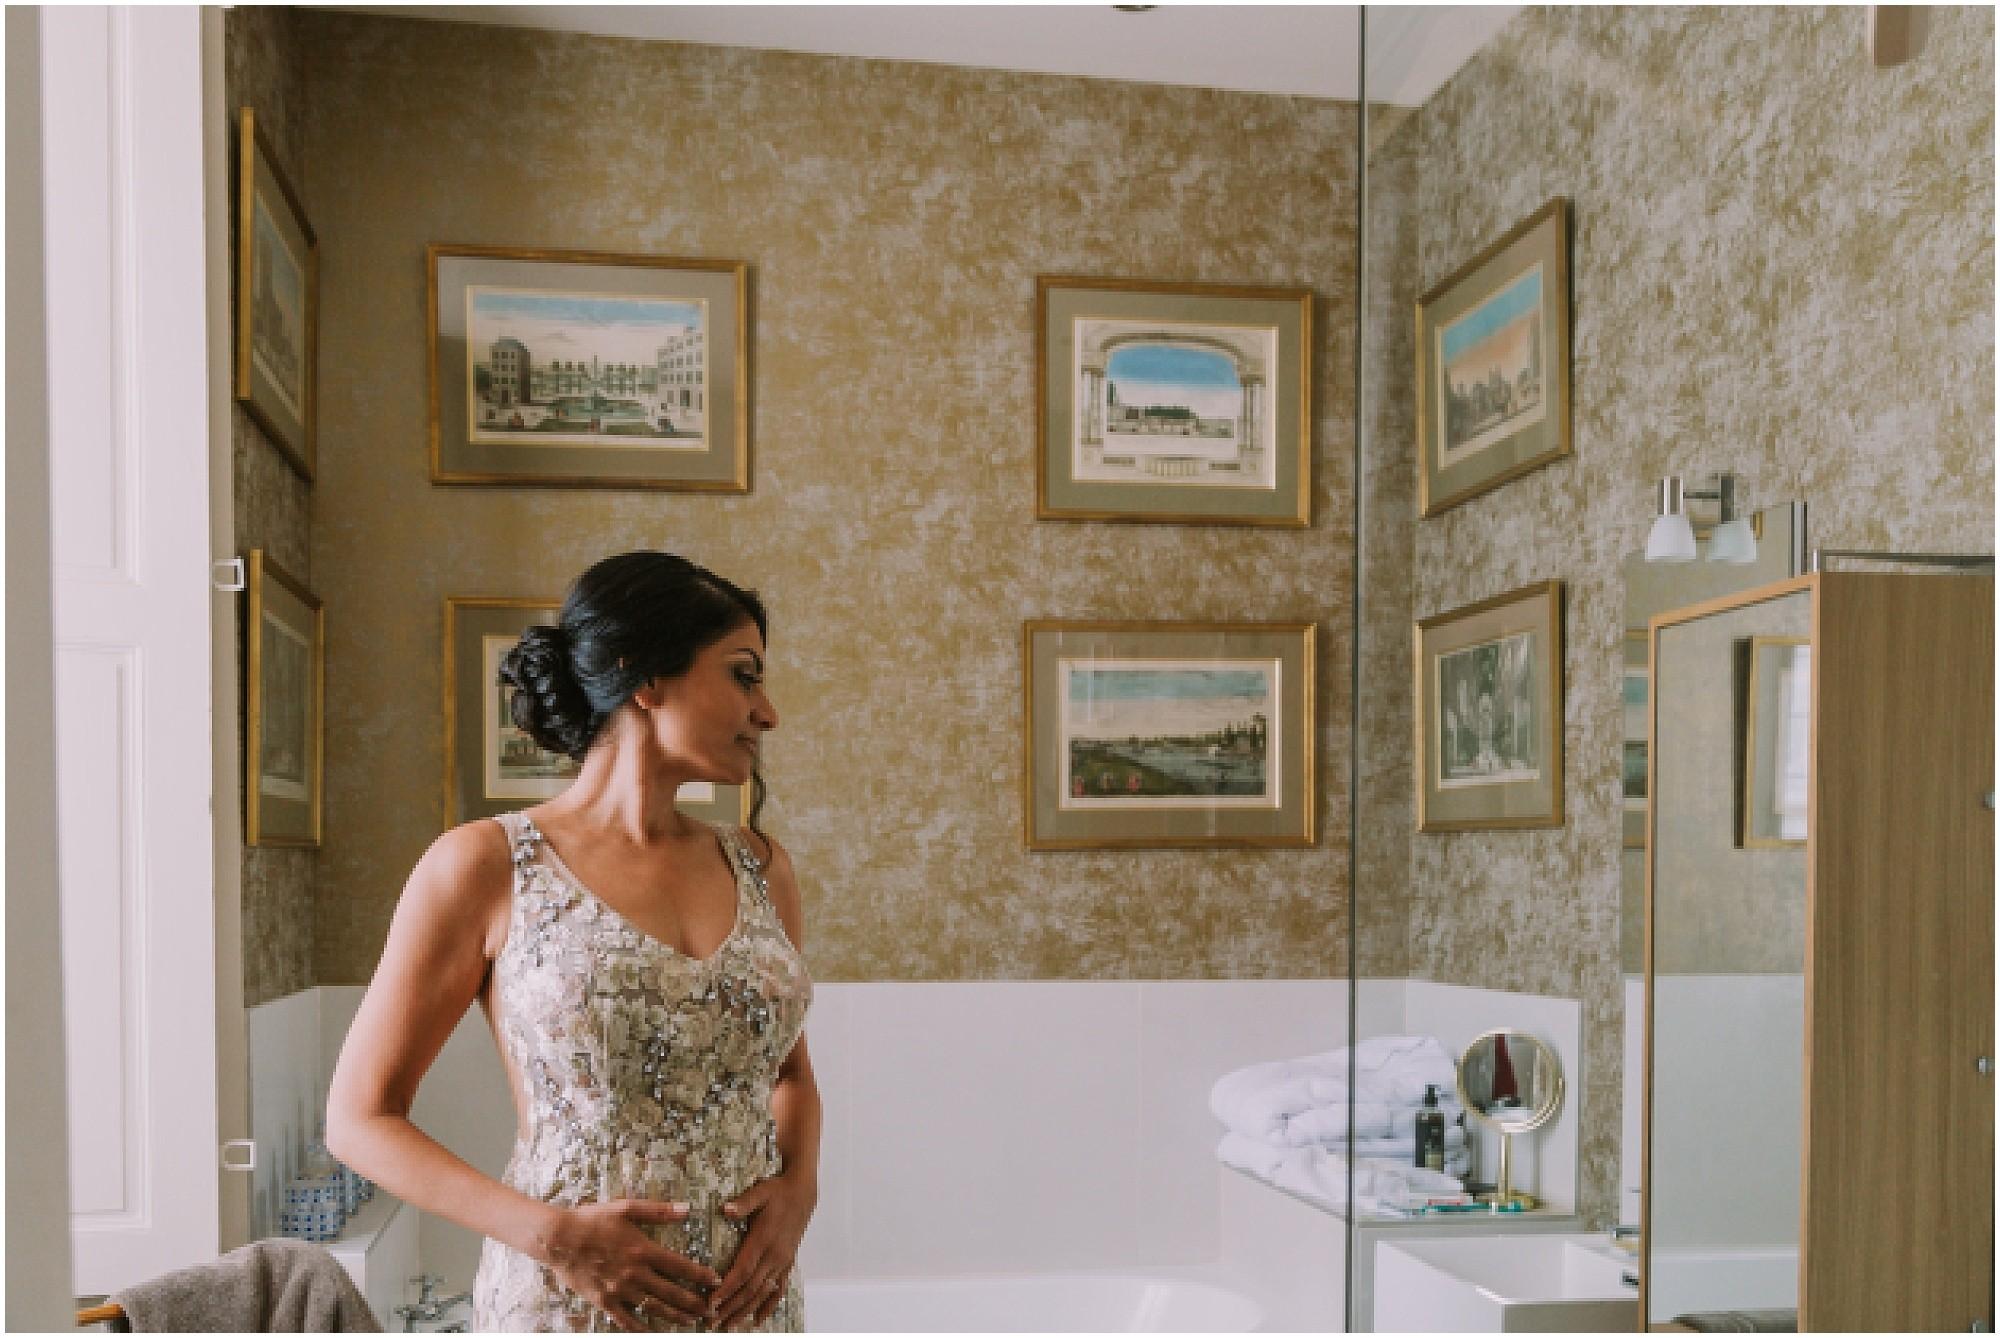 Kateryna-photos-photographer-mariage-chateau-saint-paterne-alencon-normandie-mayenne-le-mans_0011.jpg